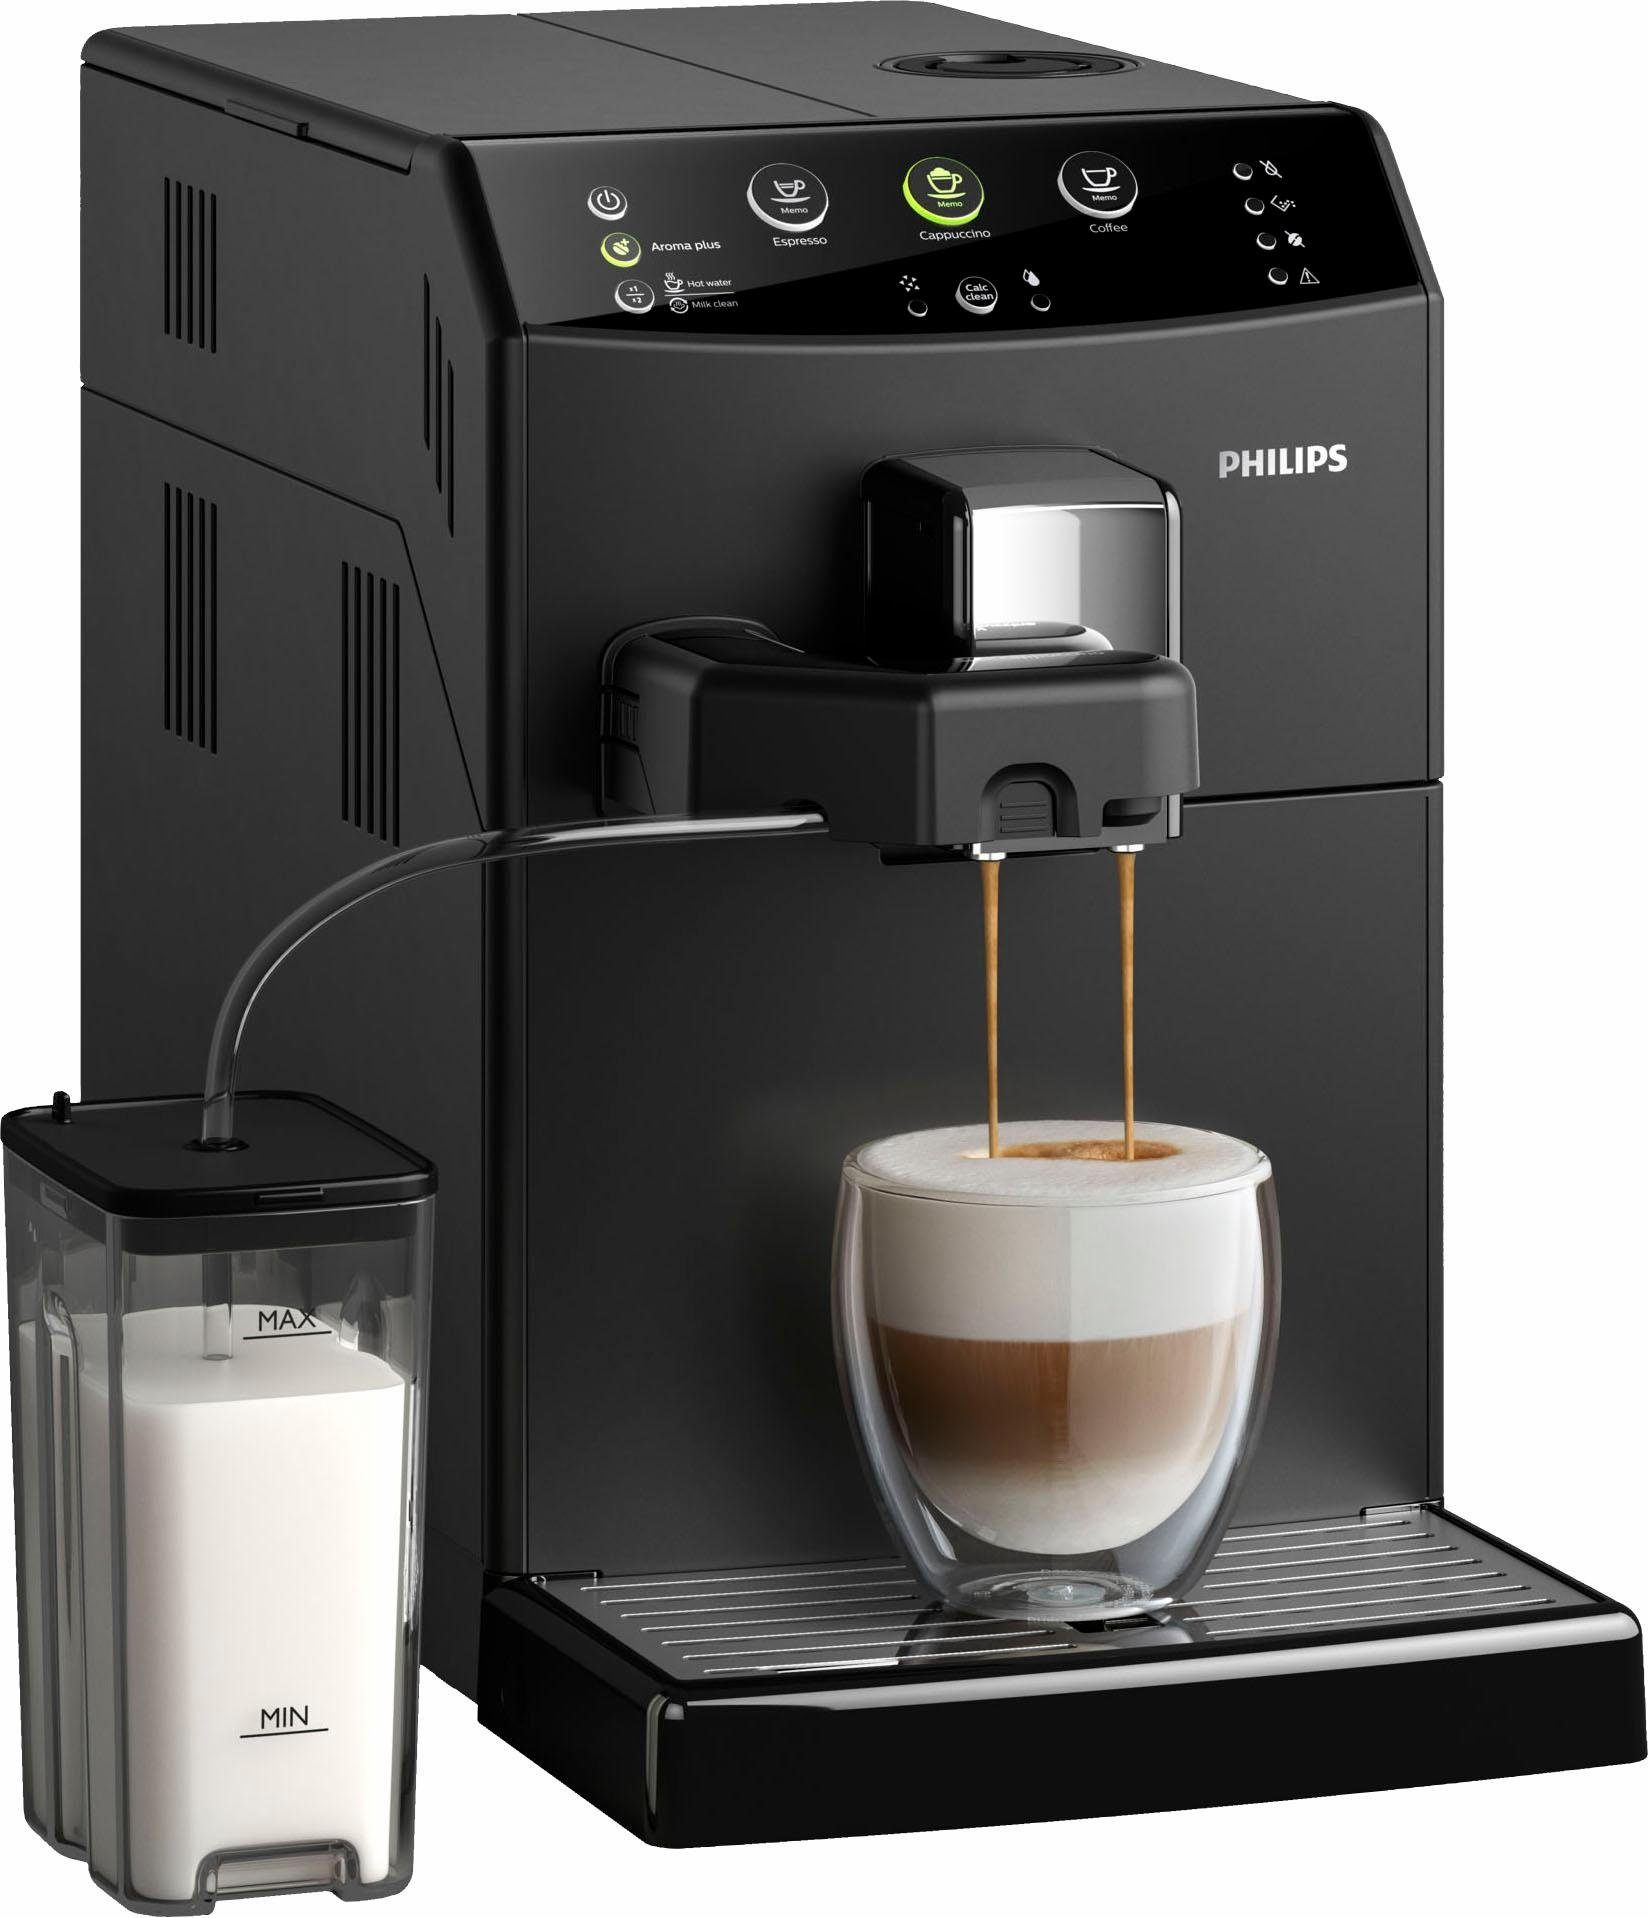 Philips Kaffeevollautomat Series 3000 HD8829/01 Easy Cappuccino, schwarz